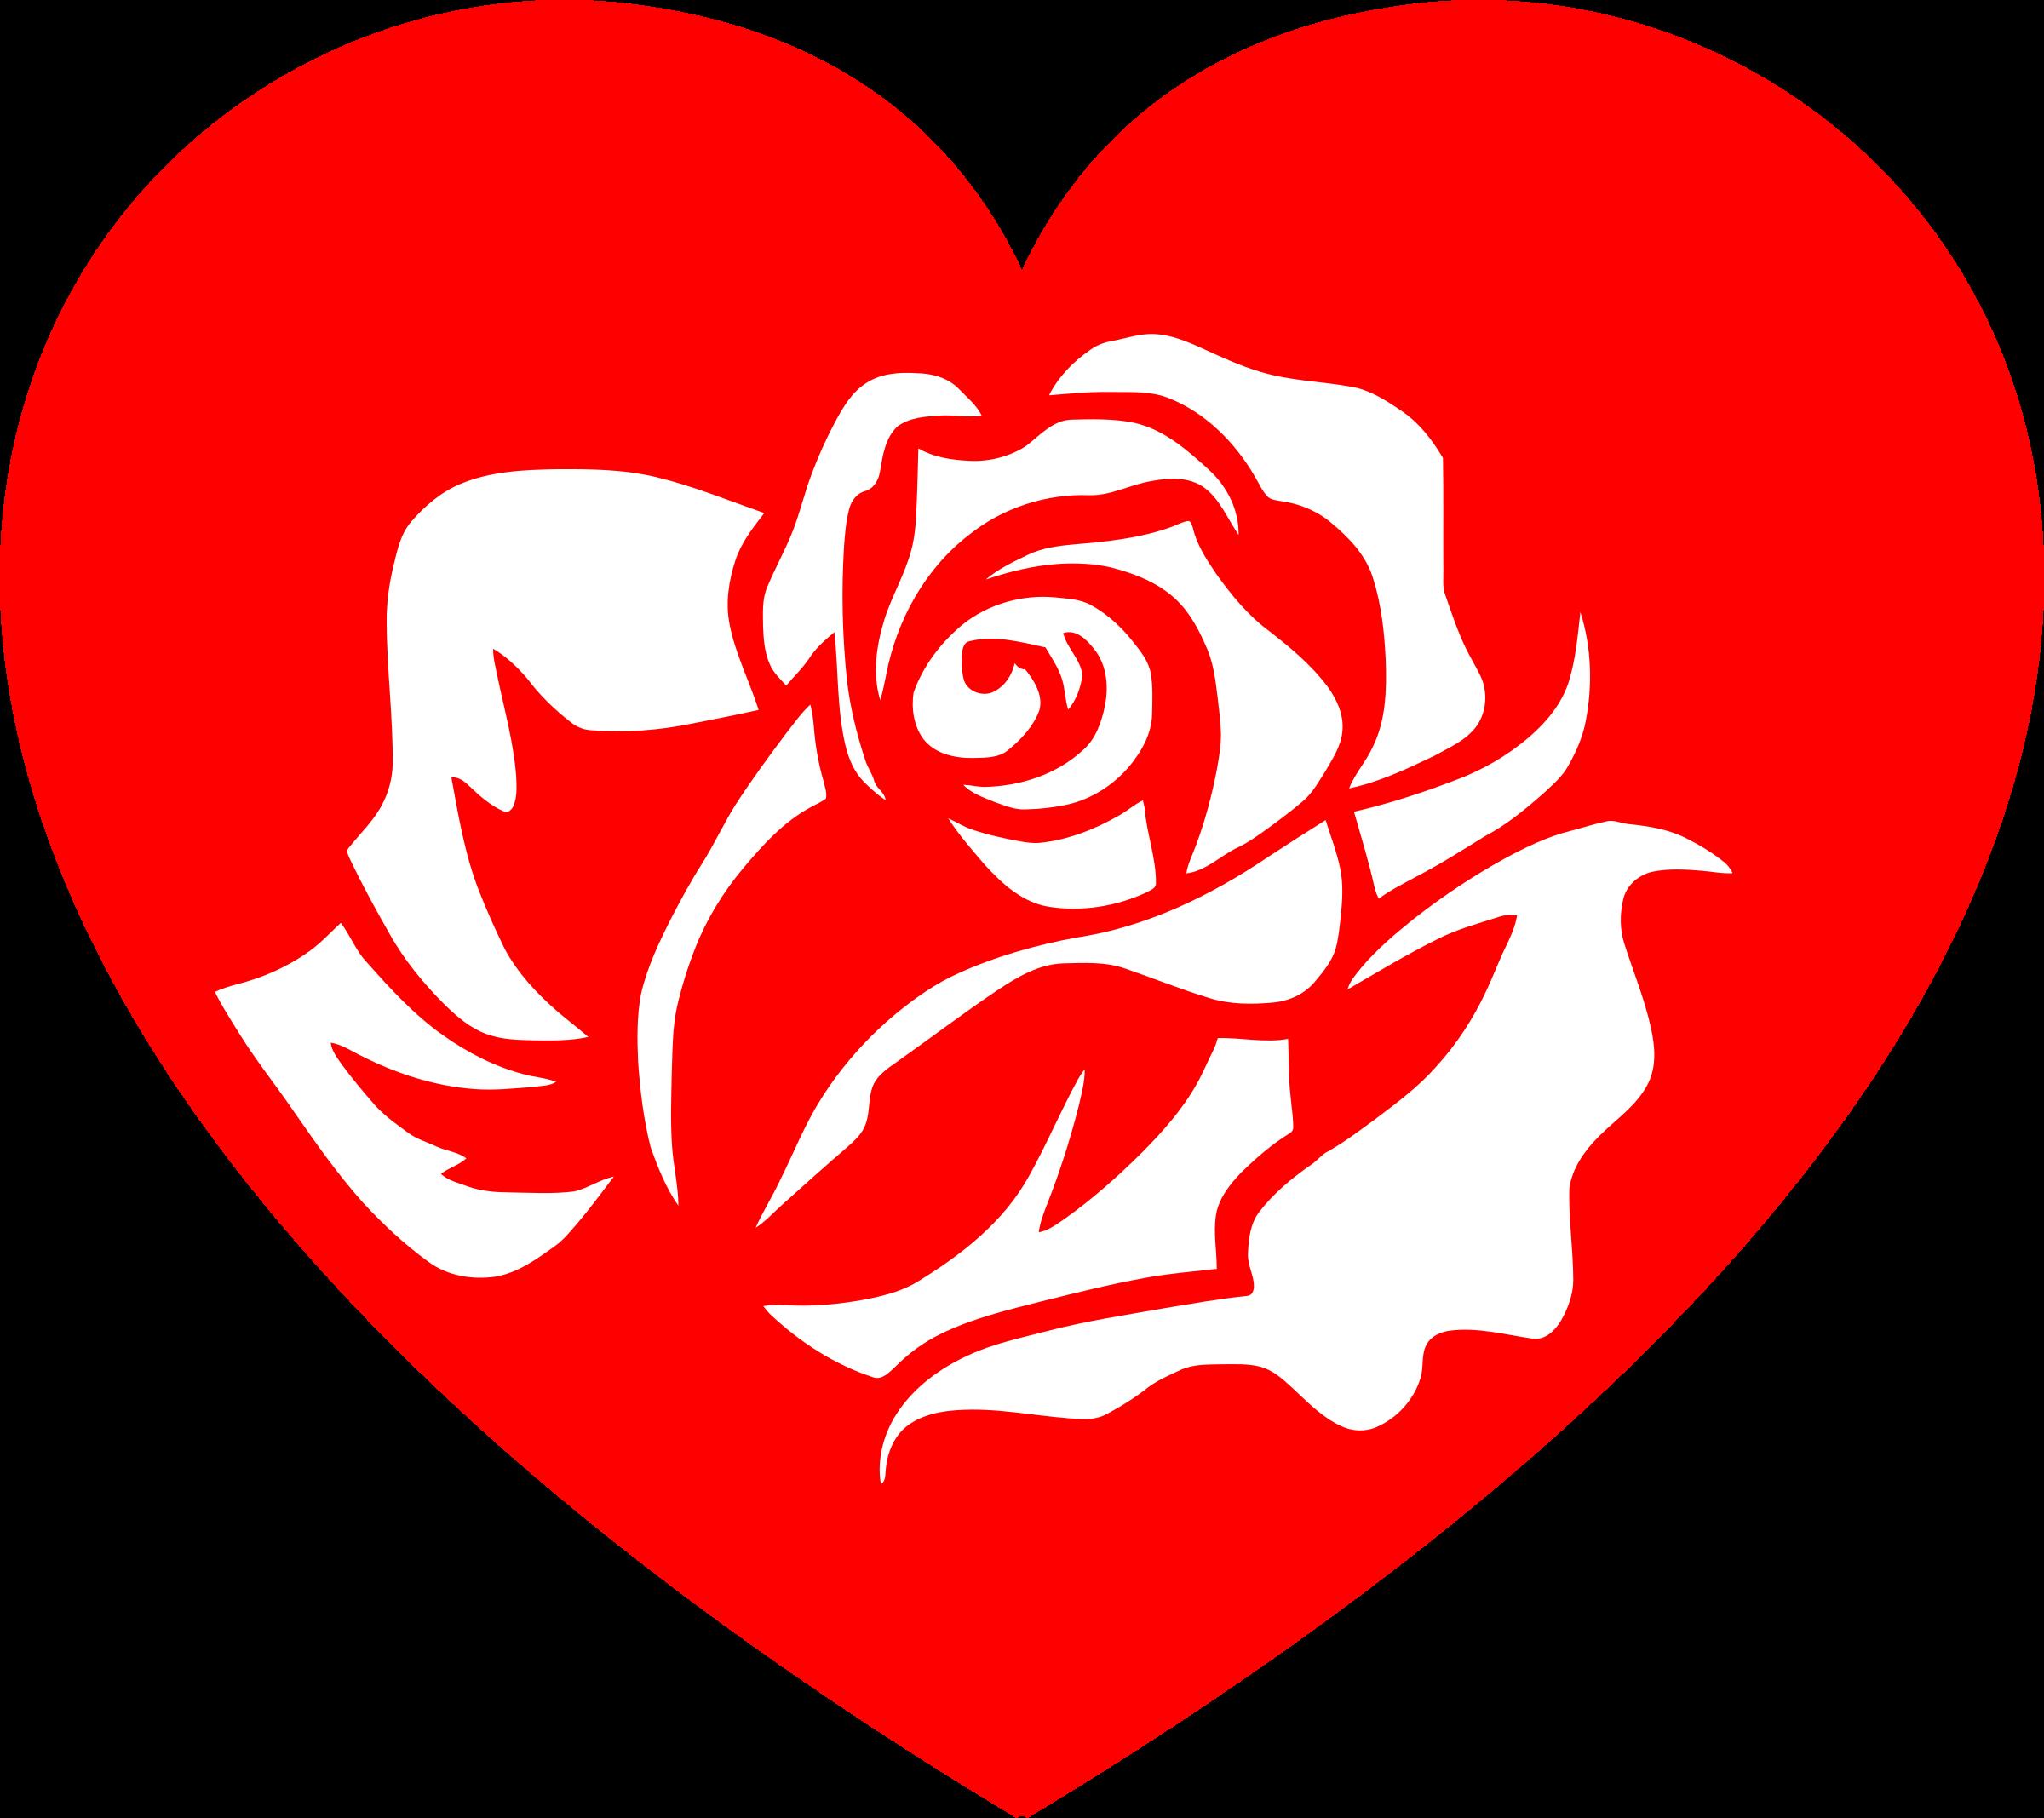 Free rose heart.